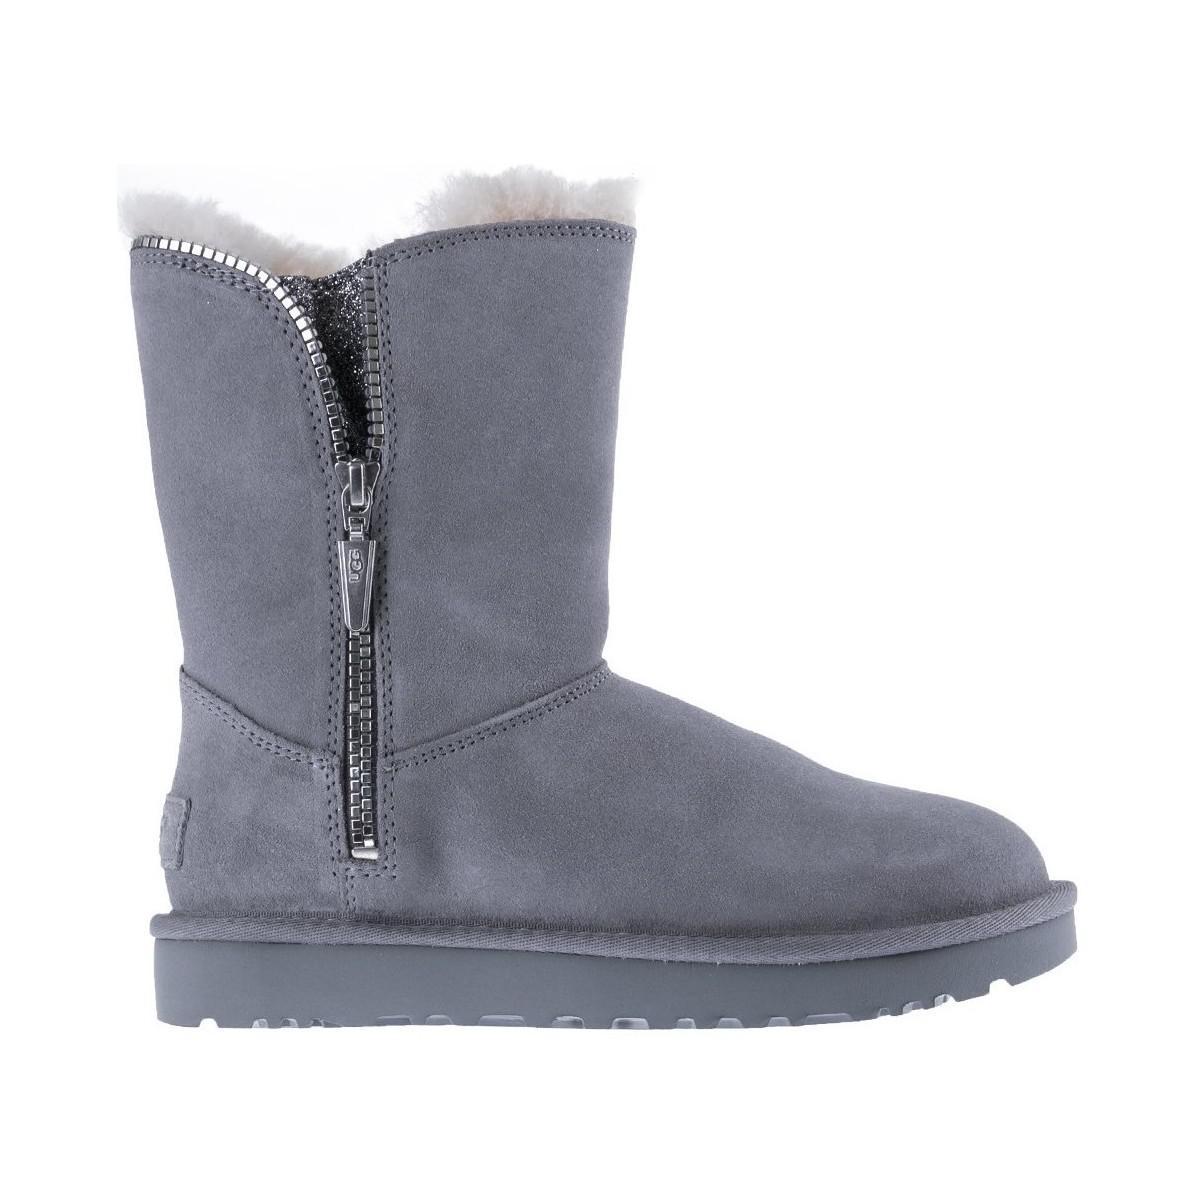 Free Shipping Wiki Store Sale UGG Marice Geyser women's Snow boots in Popular 5swsplKM